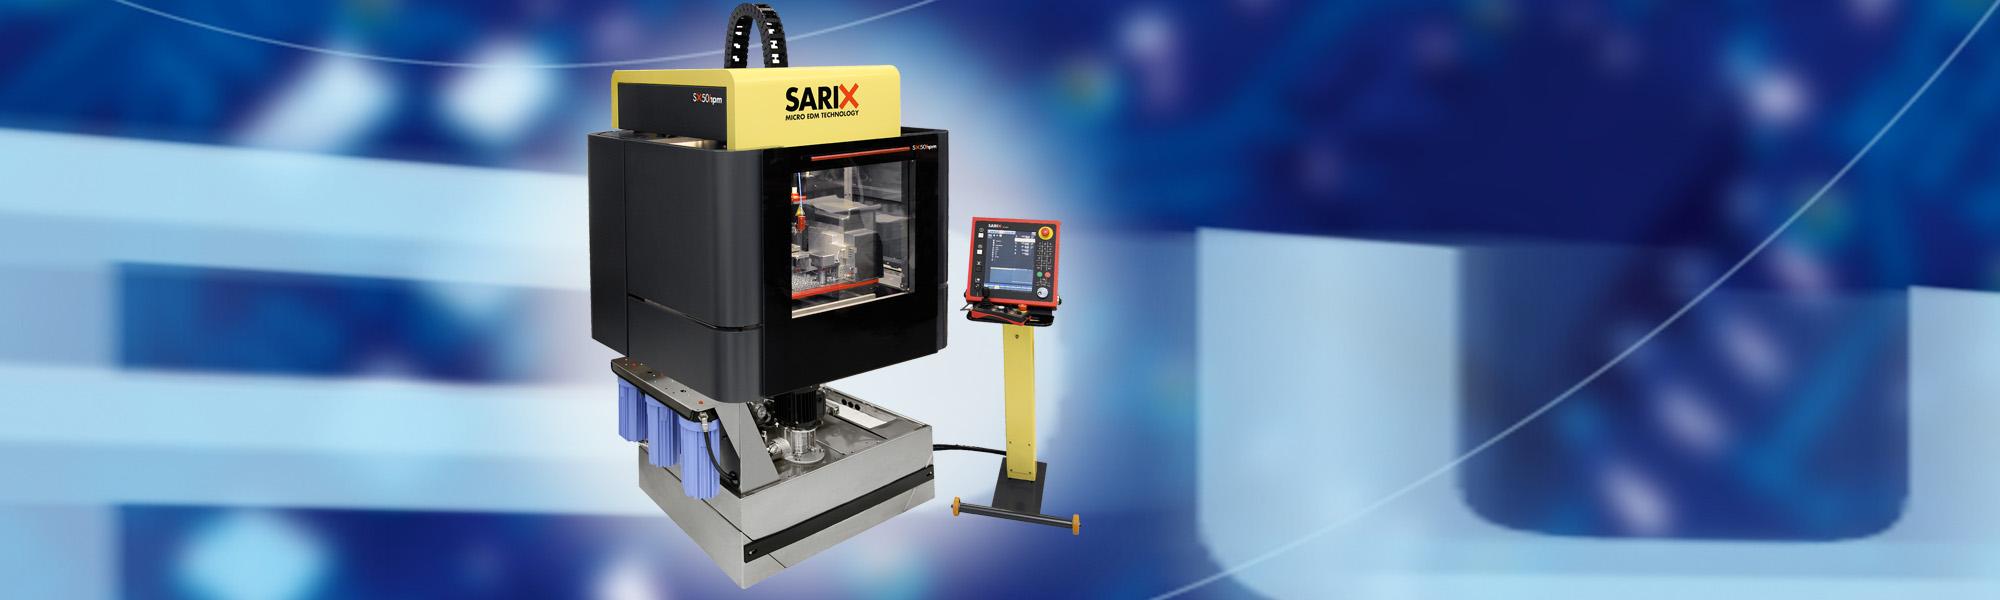 Sarix_SX-50